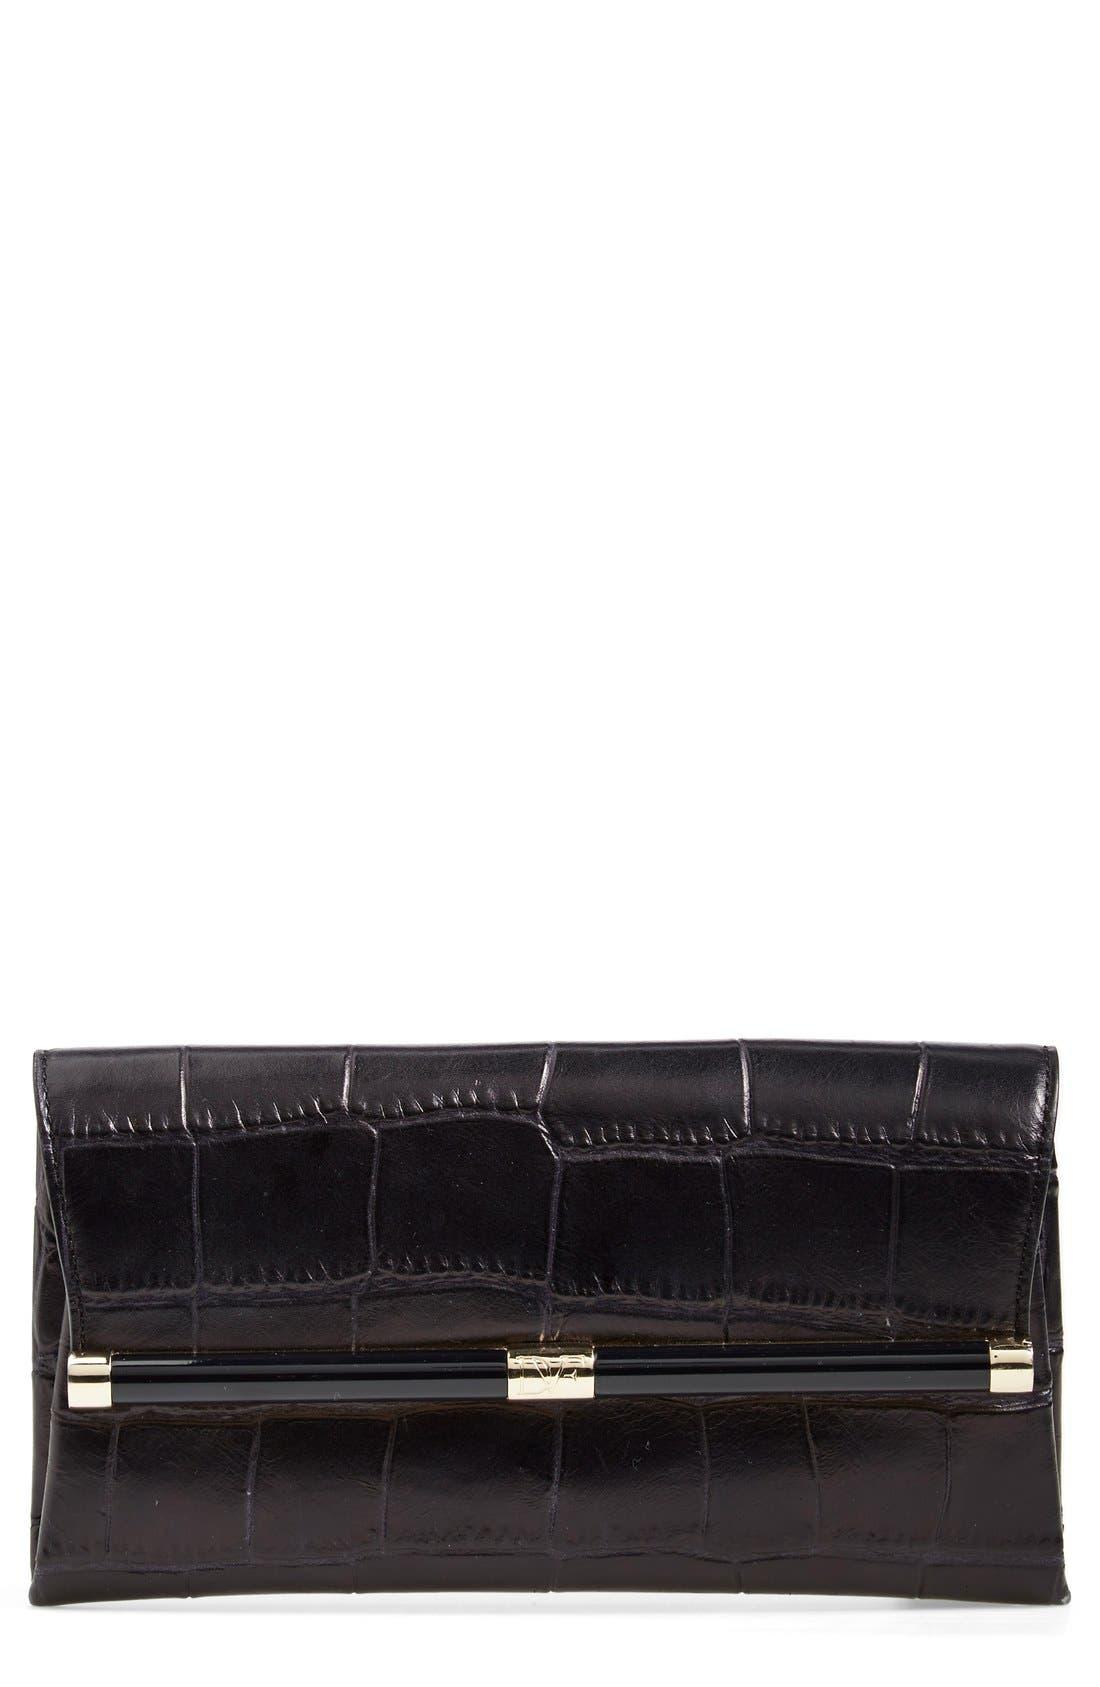 Main Image - Diane von Furstenberg '440' Croc-Embossed Leather Envelope Clutch